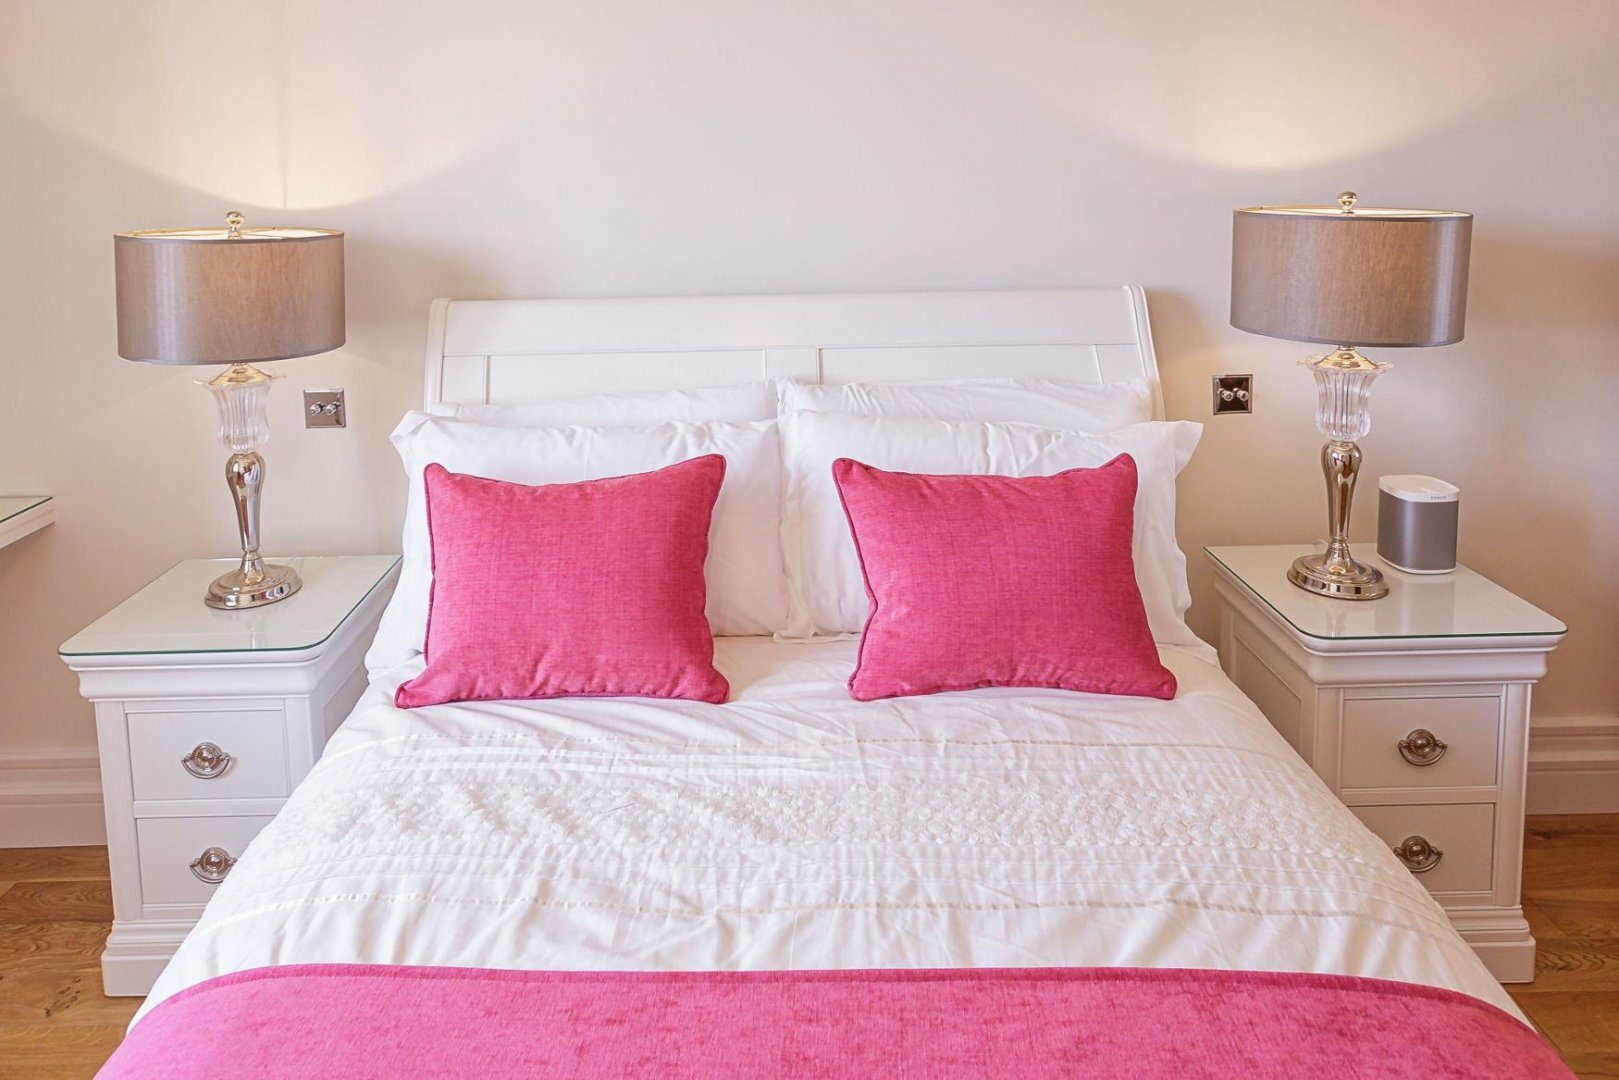 Luxquisite 5-Star Killarney Residence photo 31